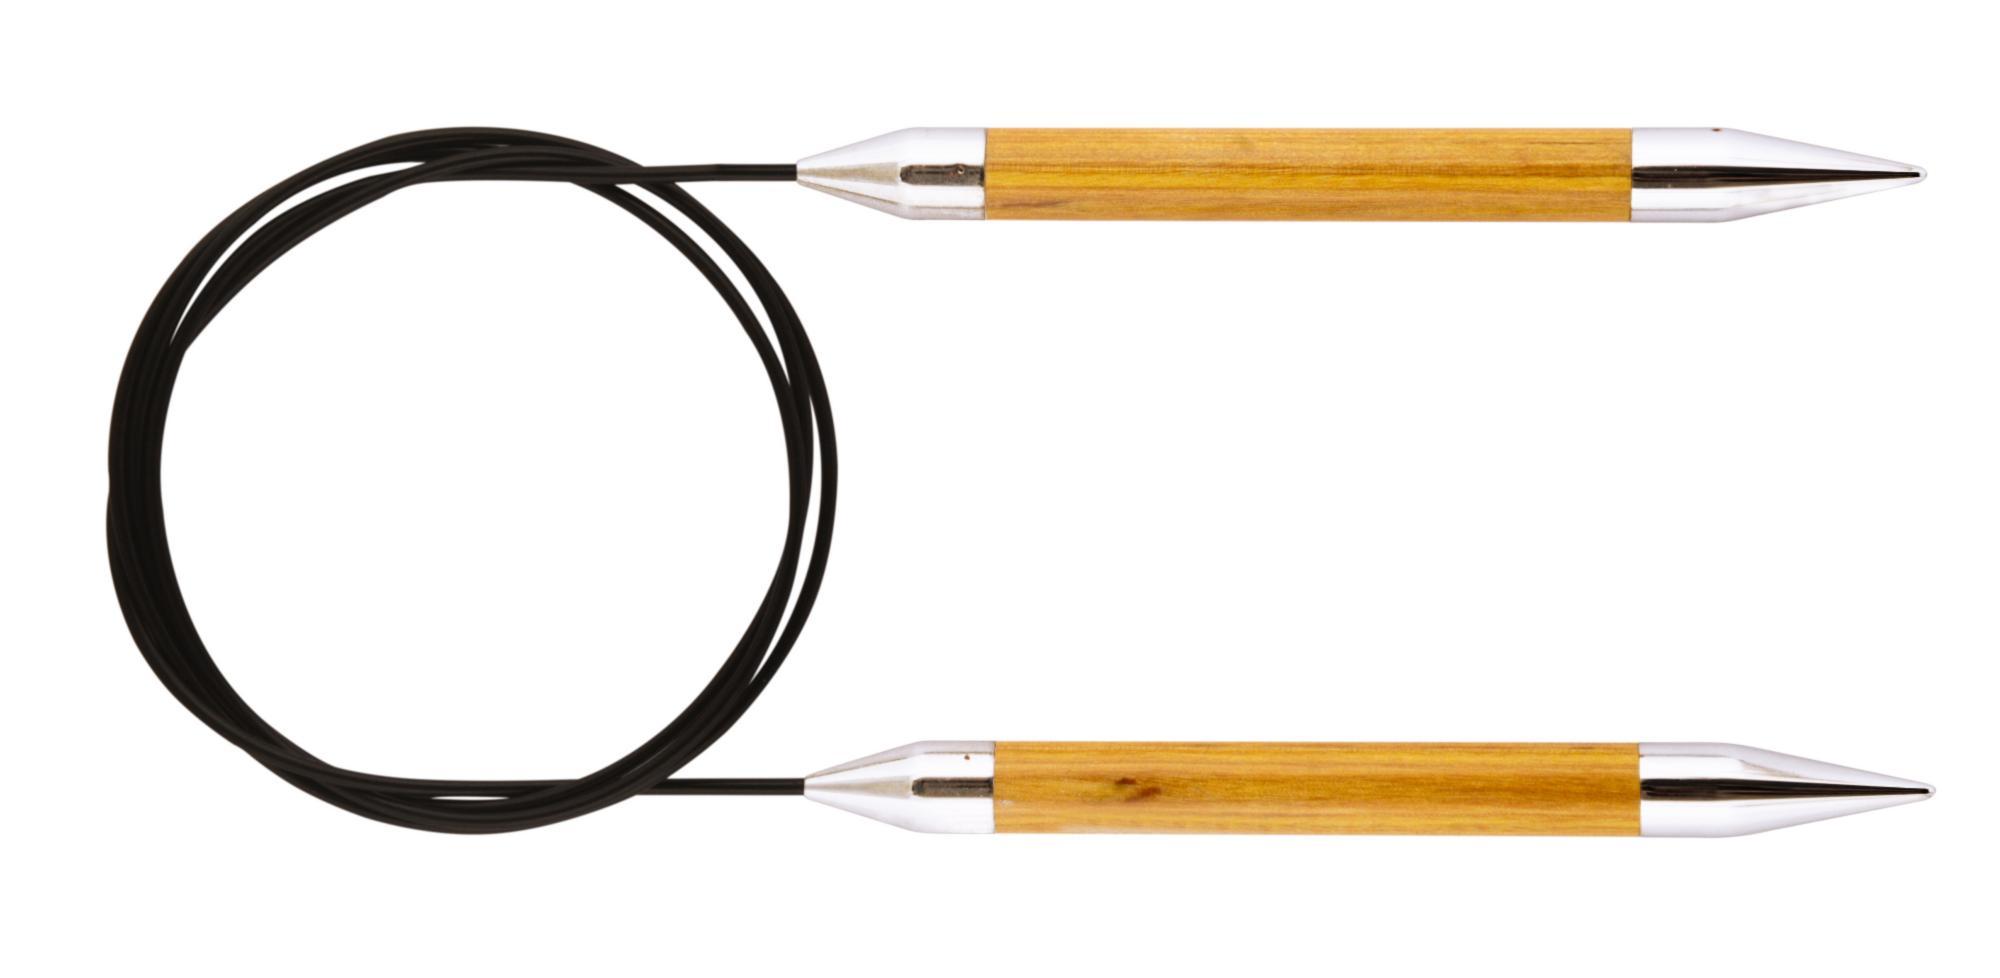 Спицы круговые 100 см Royale KnitPro, 29125, 12.00 мм